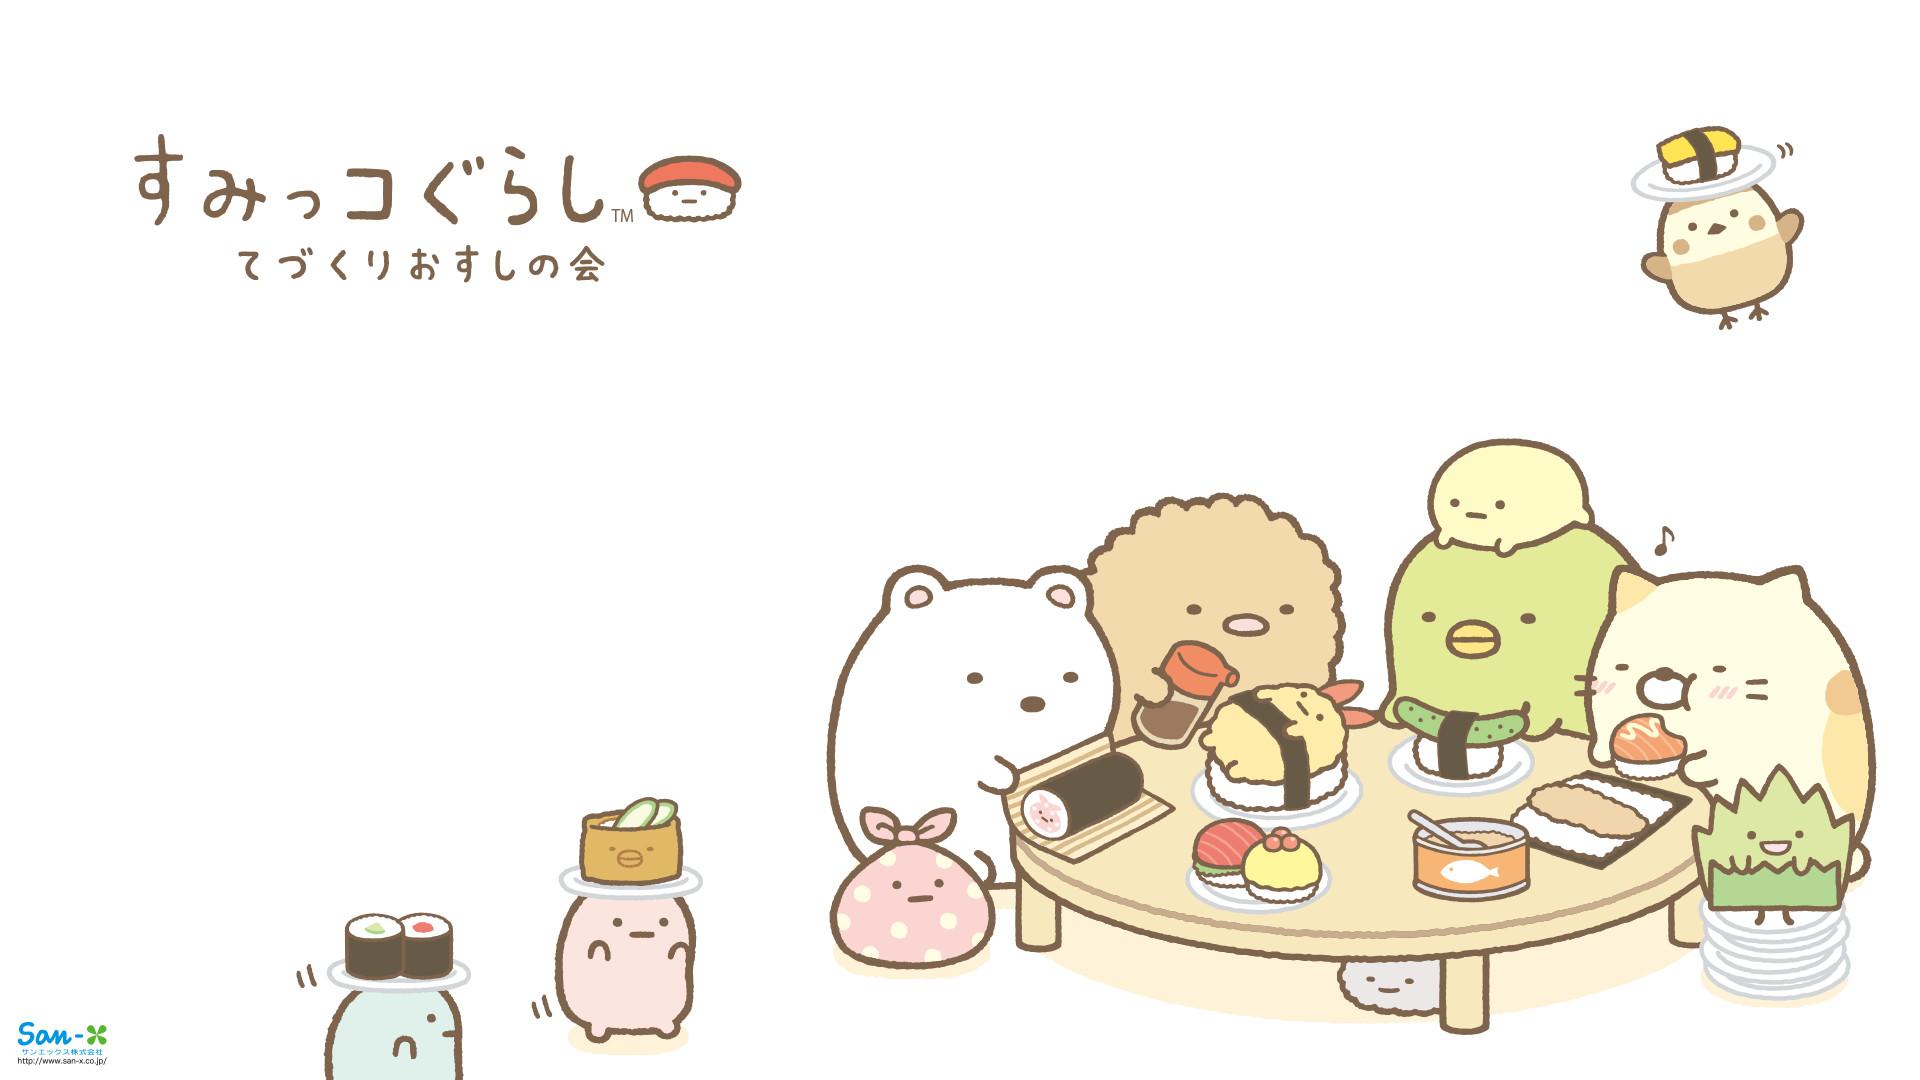 Kawaii Desktop Backgrounds (68+ images)